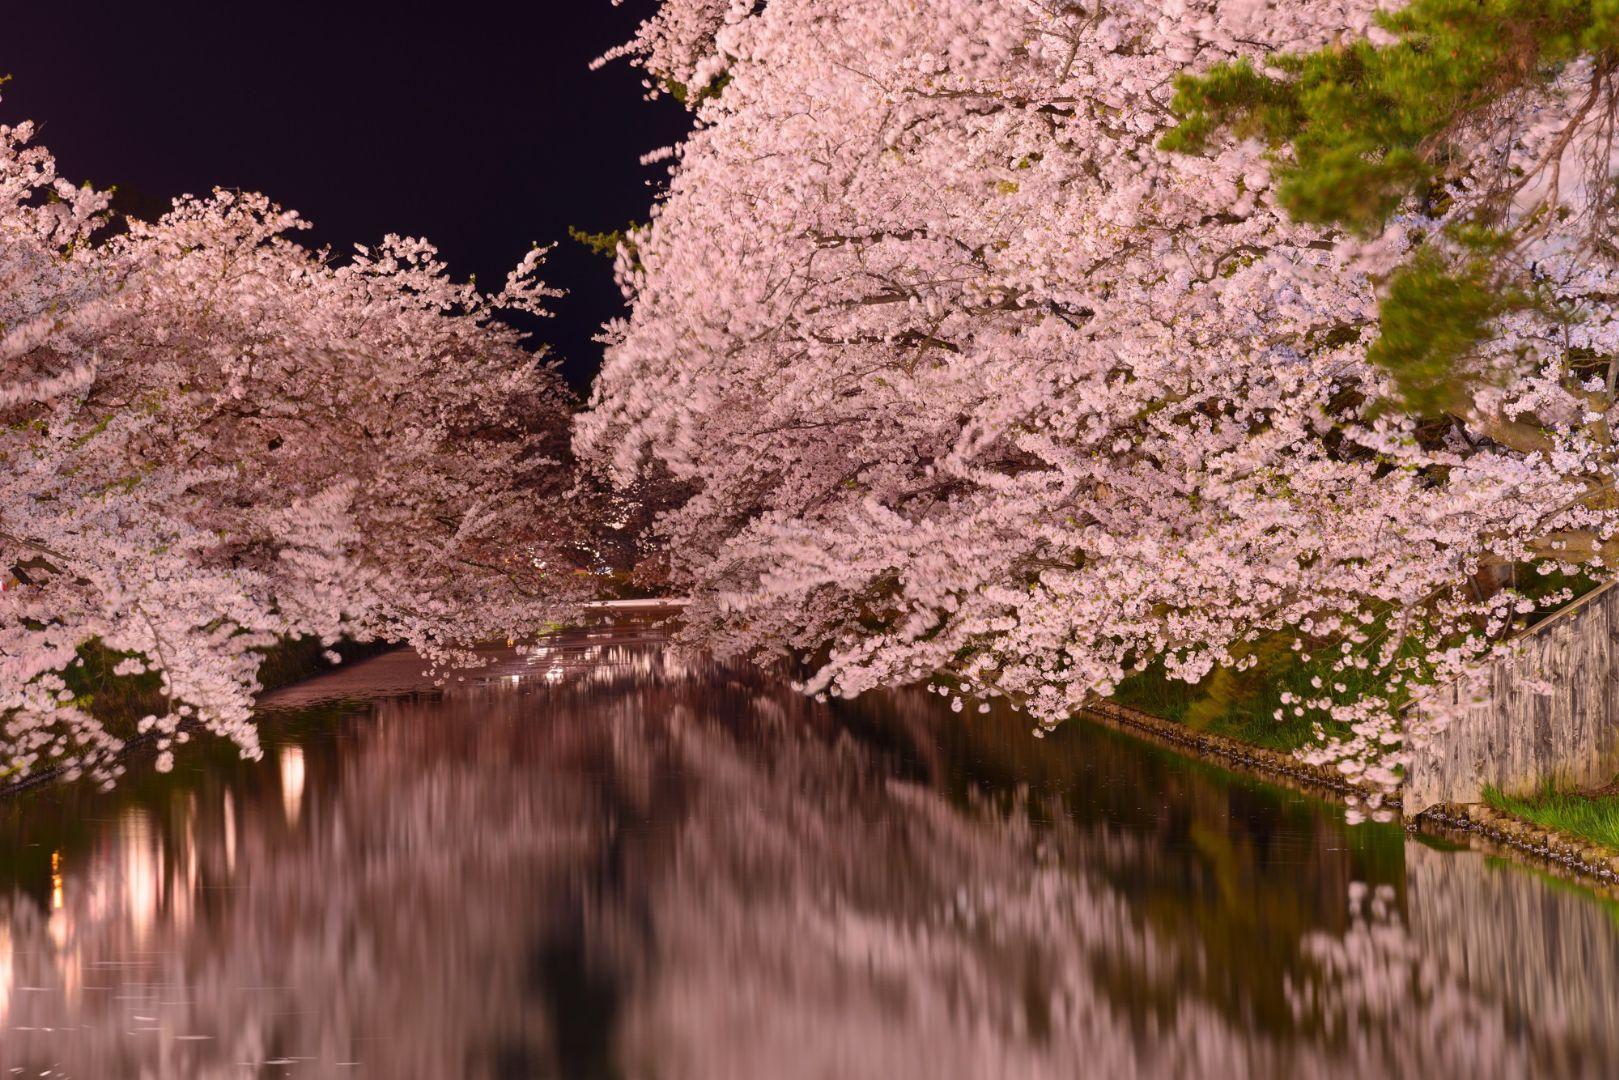 hiriosaki park sakura Cherry Blossoms